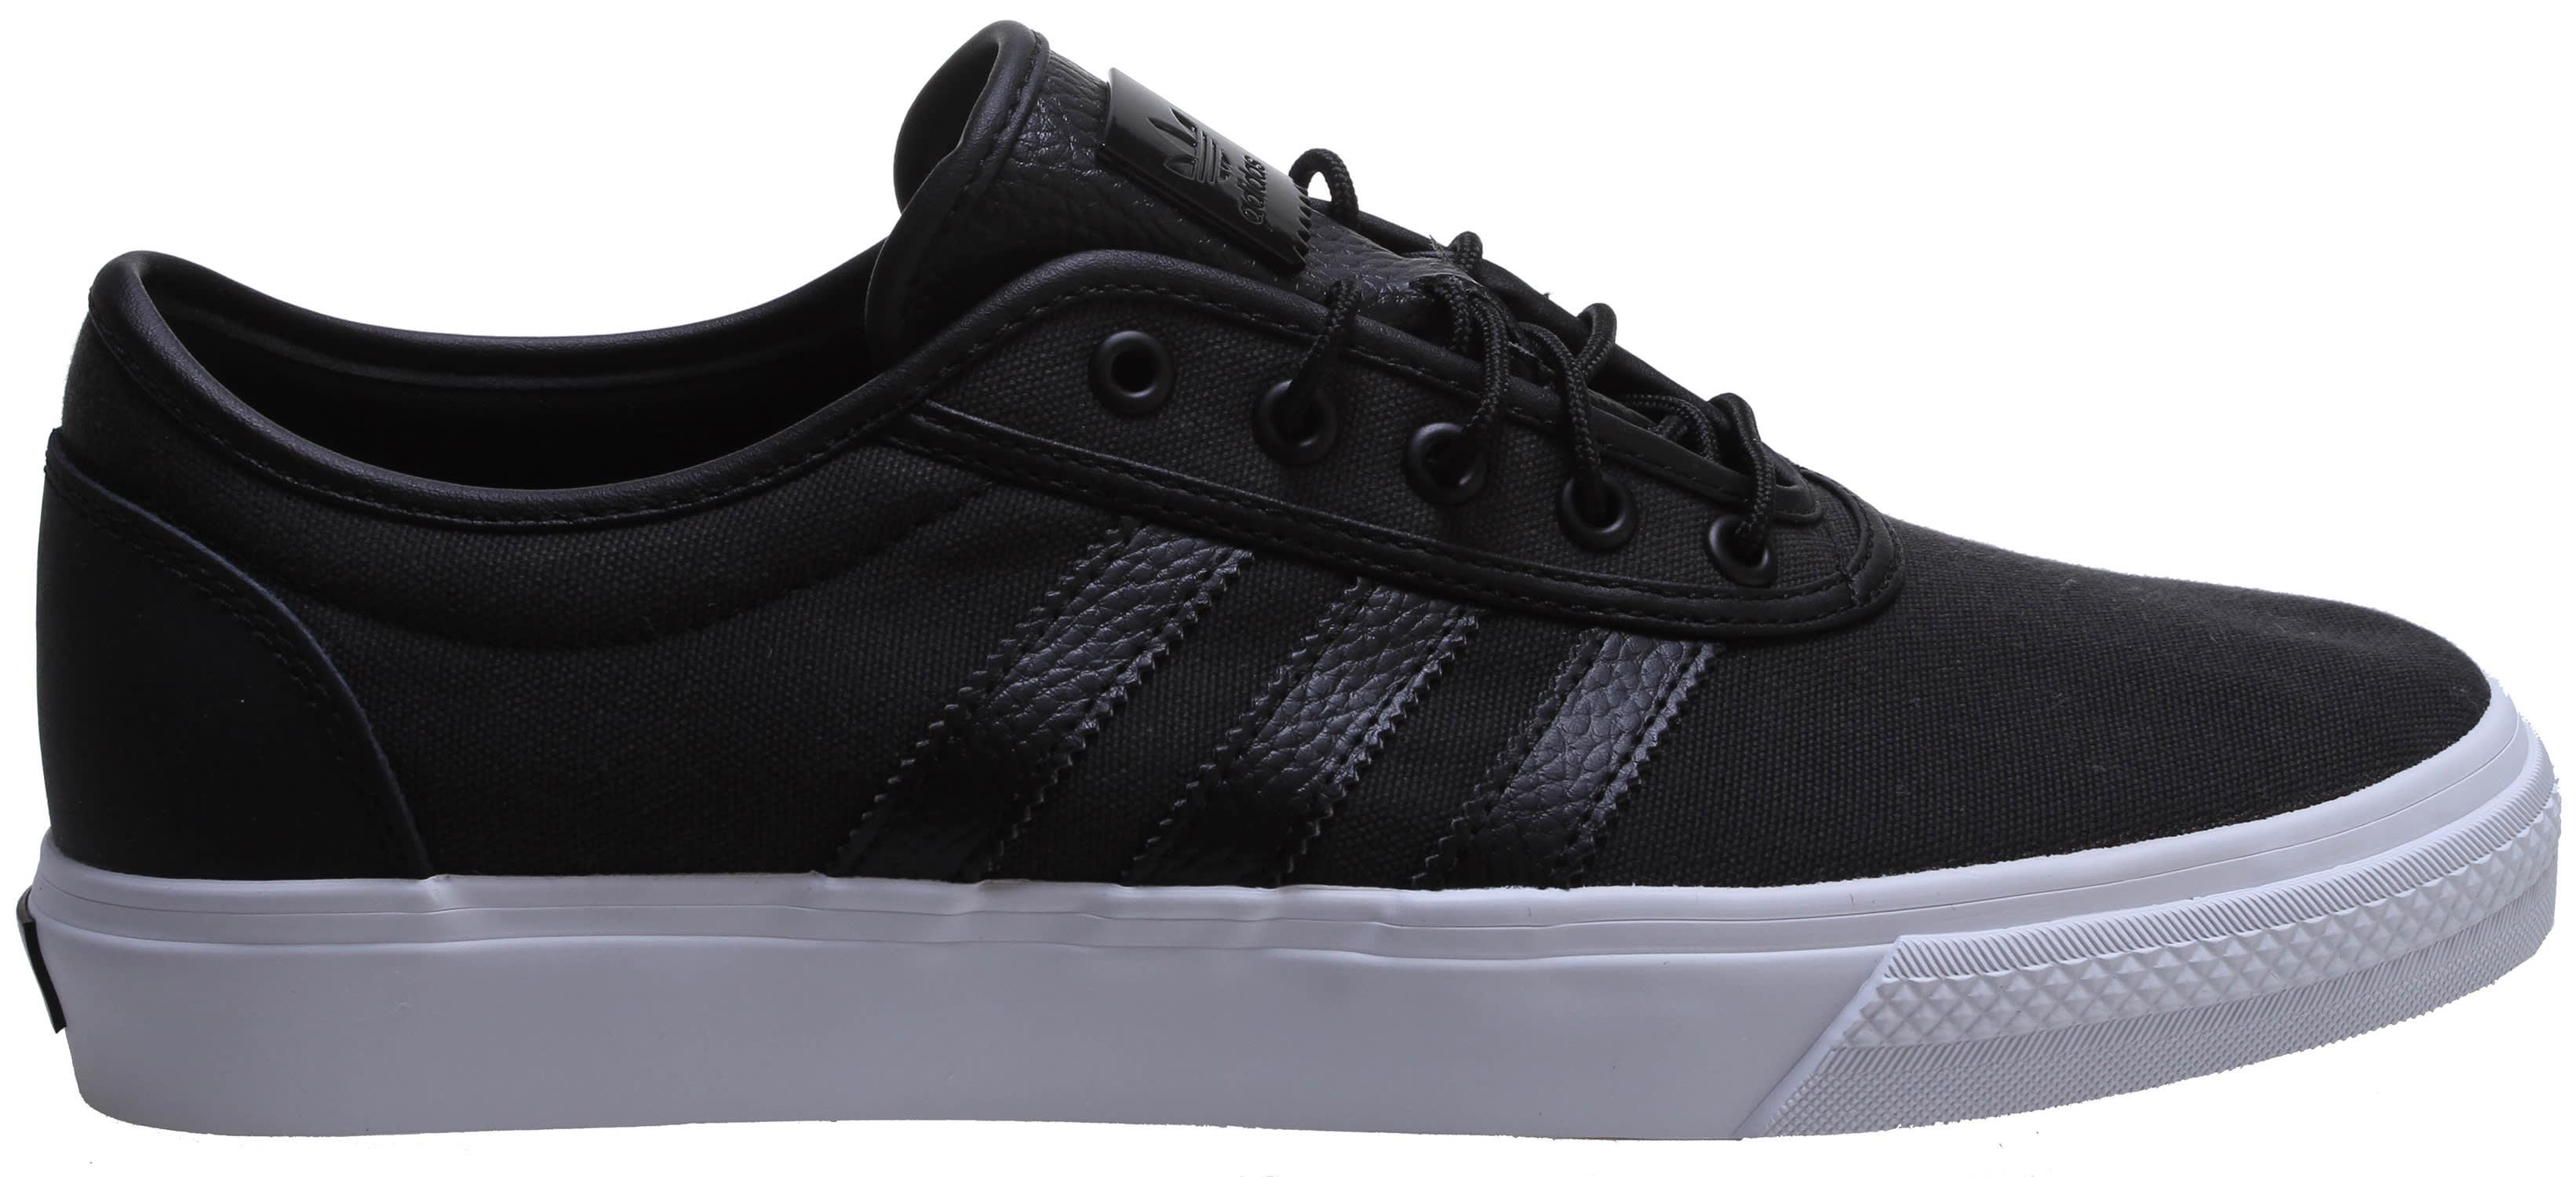 cheap for discount baecd 56530 Adidas Adi-Ease Classified Skate Shoes - thumbnail 1